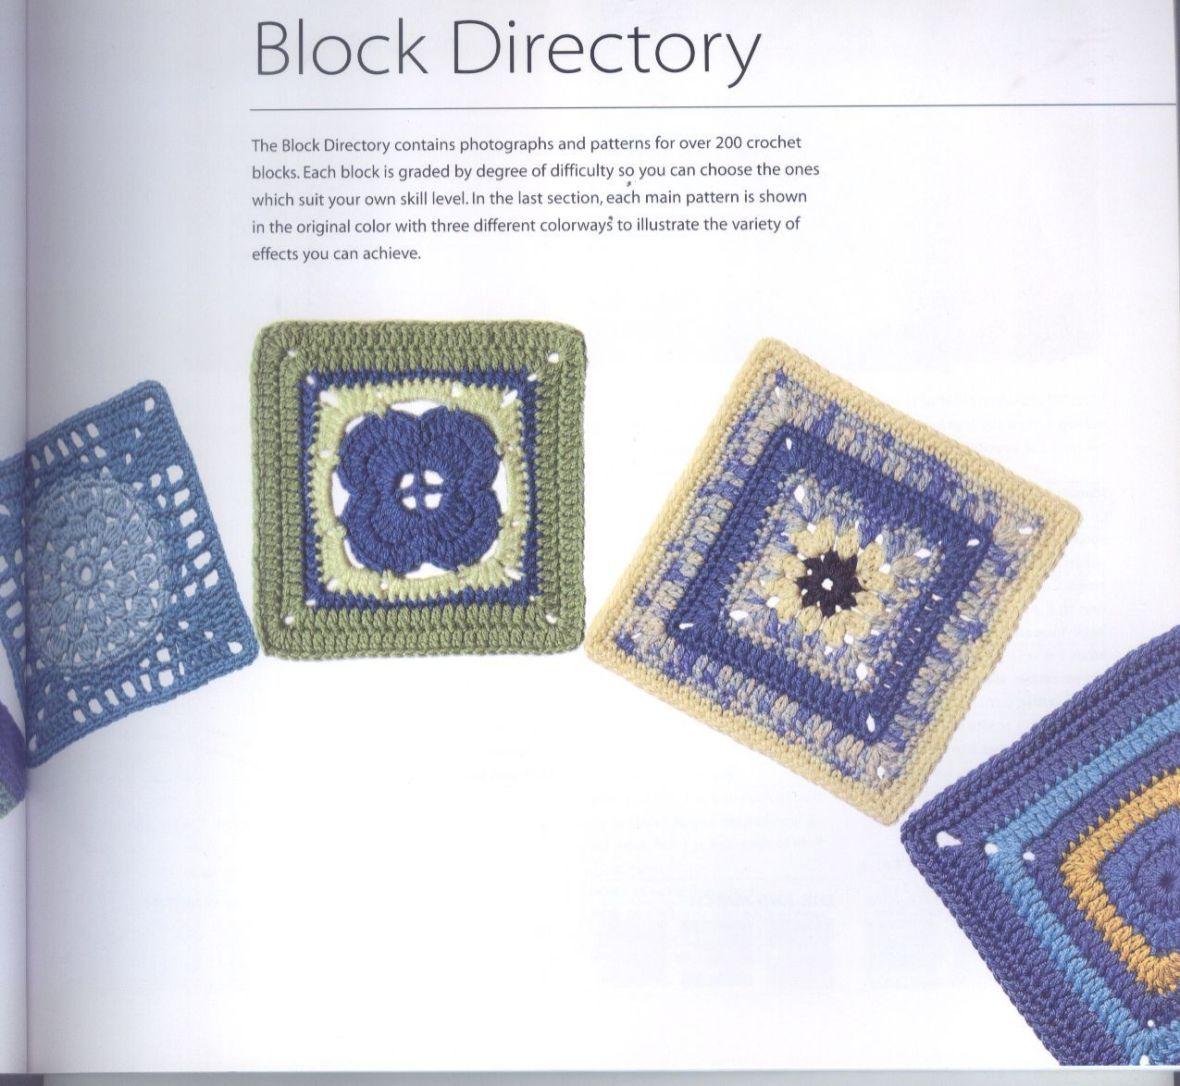 200 Crocheted Blocks for blankets, throws & Afghans 033